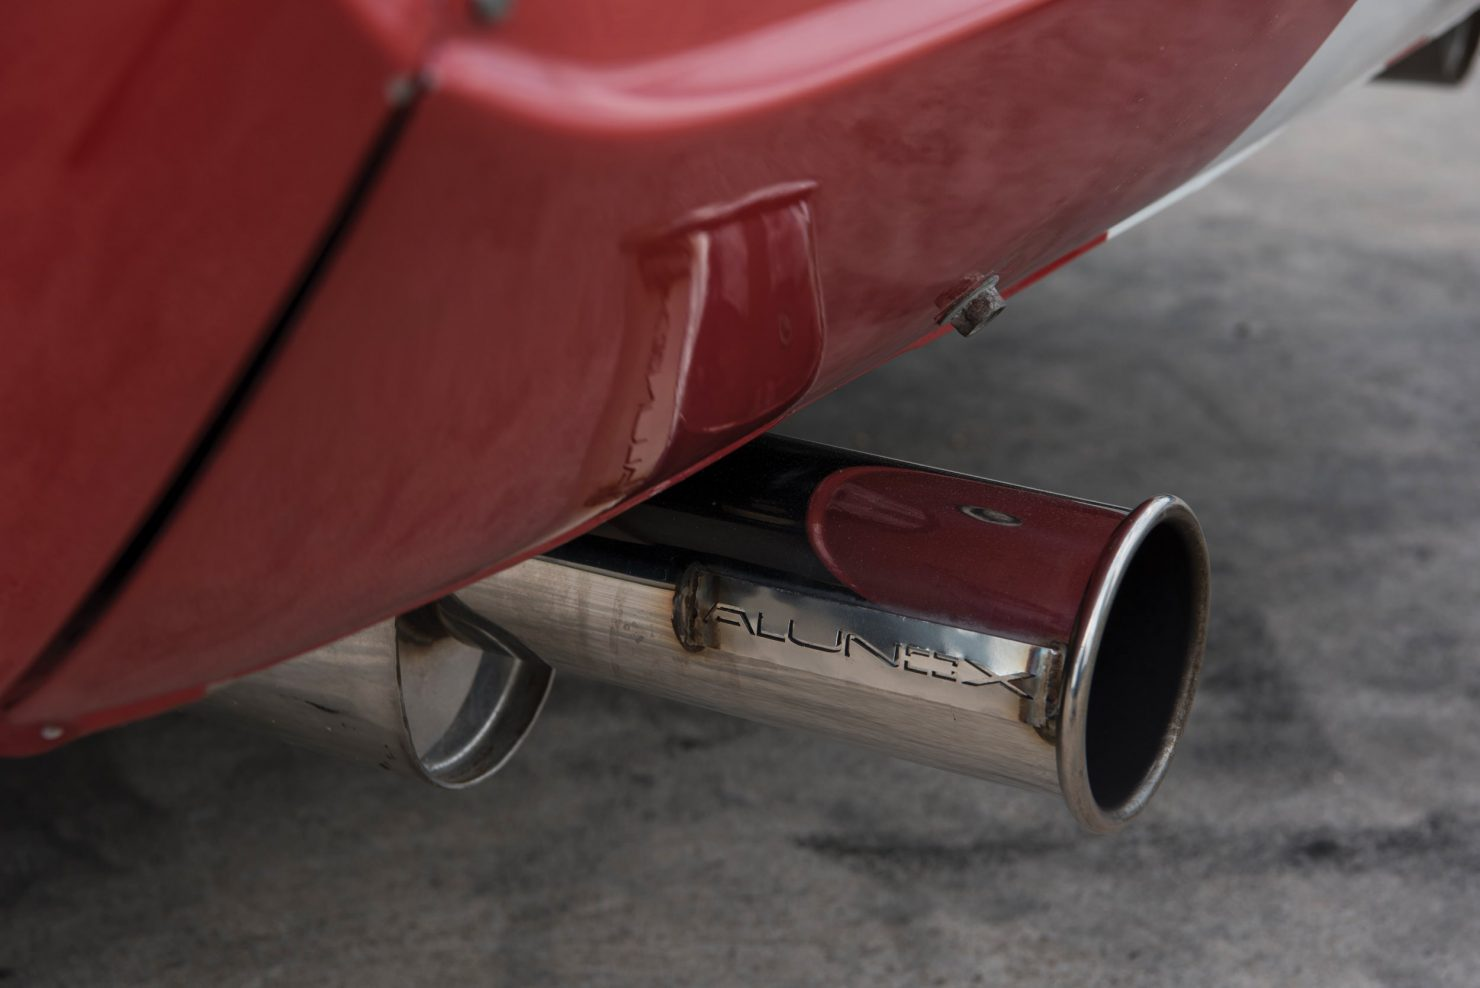 shelby gt350 race car 17 1480x988 - 1966 Shelby GT350 - Period SCCA Race Car